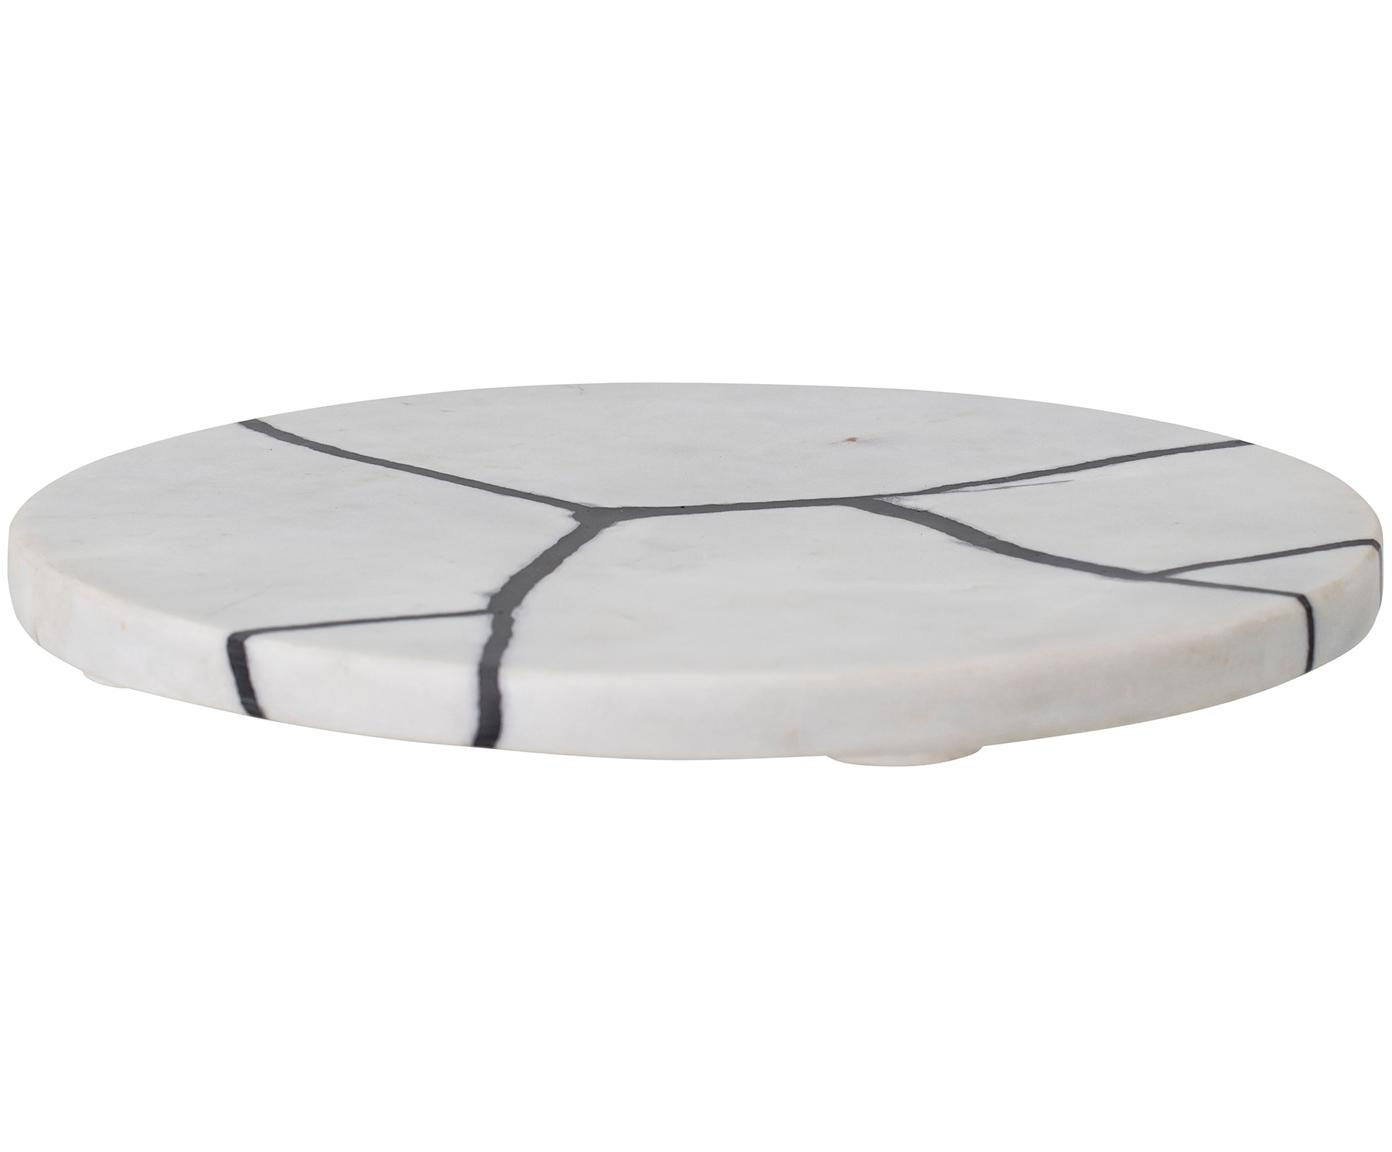 Fuente de mármol Isadora, Mármol, poliresina, Blanco veteado, negro, Ø 21 cm